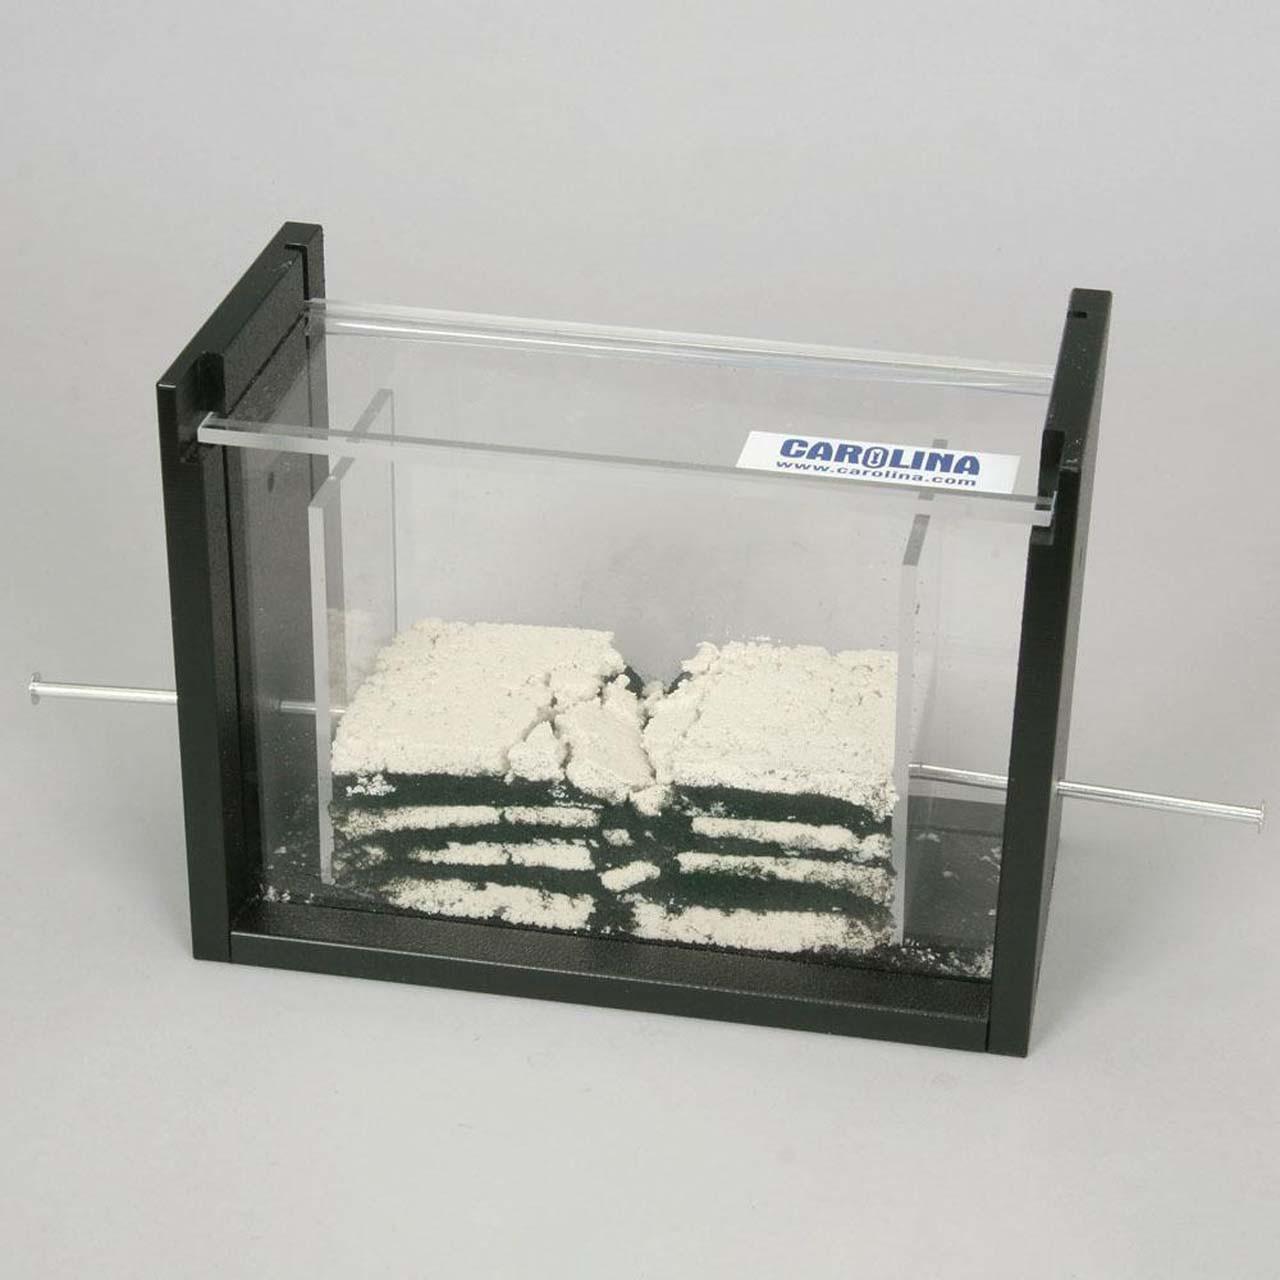 ES5.03 - Tectonic sandbox